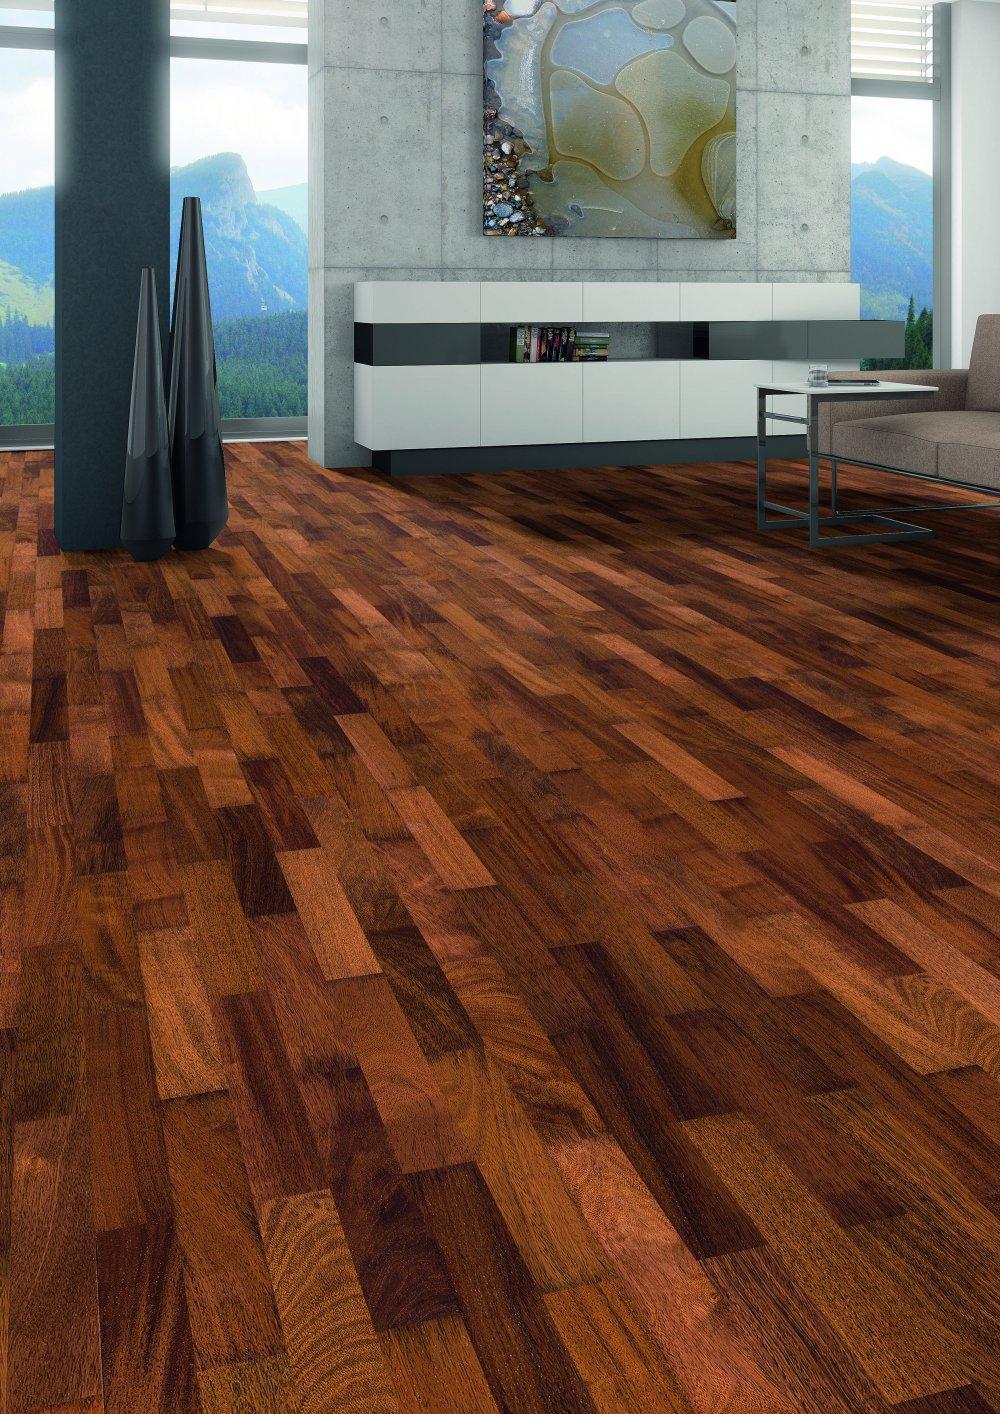 518561 haro parkett stab allegro merbau lackiert. Black Bedroom Furniture Sets. Home Design Ideas